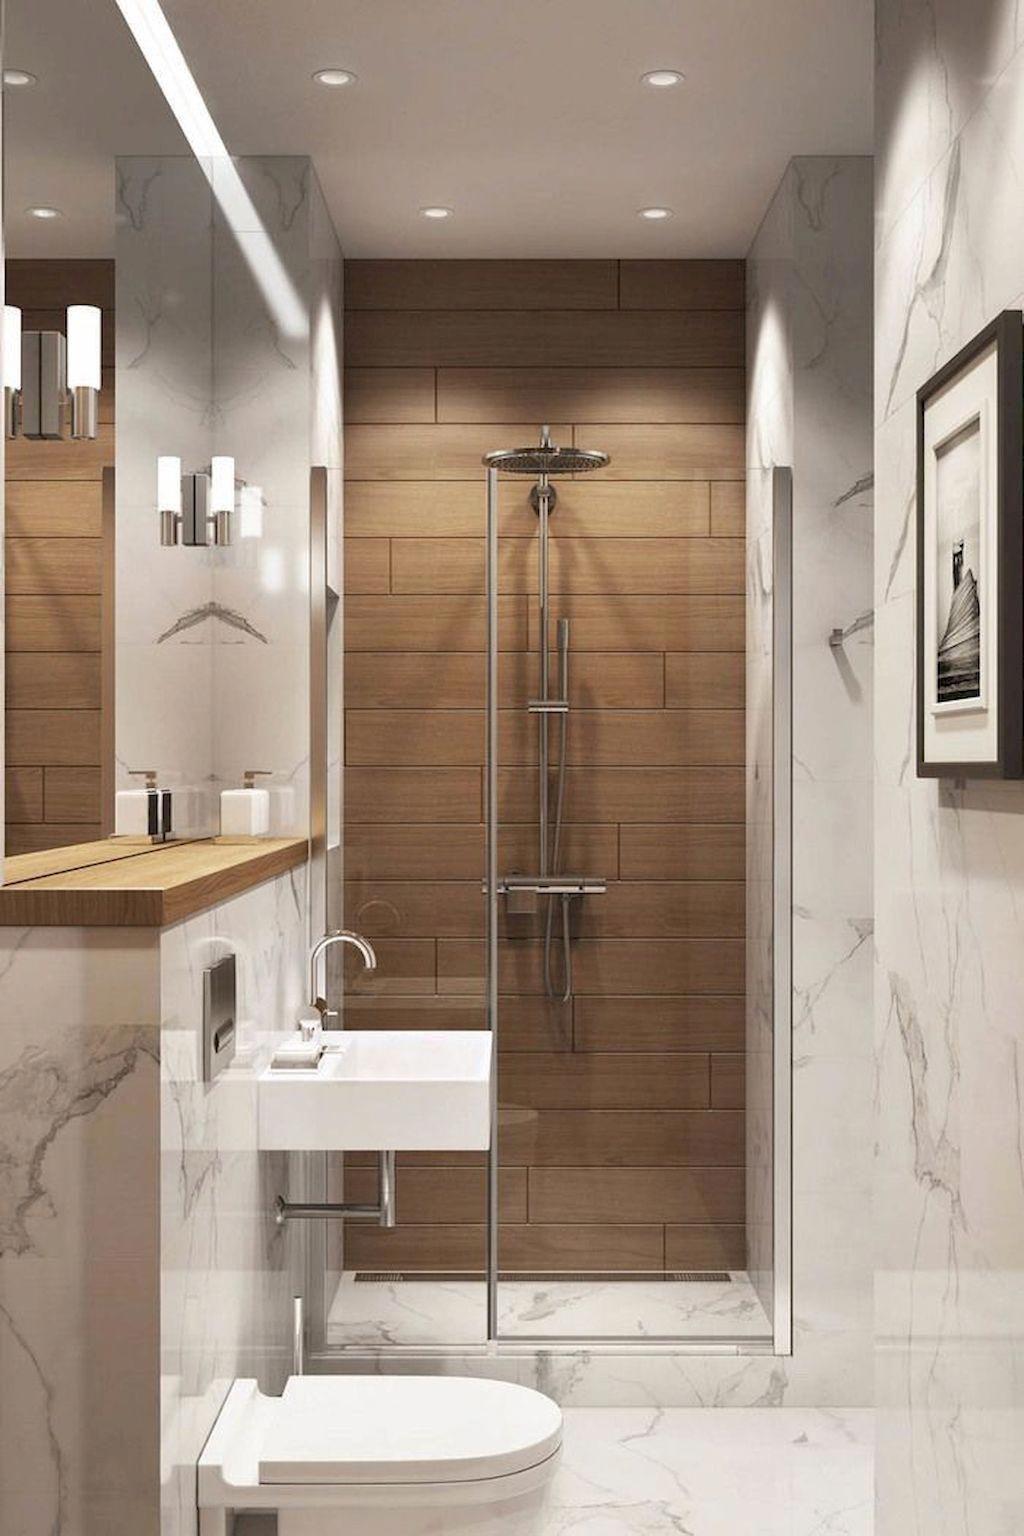 Wooden Bathroom Accessories Dark Blue Bathroom Decor Navy Blue Bathroom Accessories Sets 20190209 Ide Kamar Mandi Kamar Mandi Mewah Modern